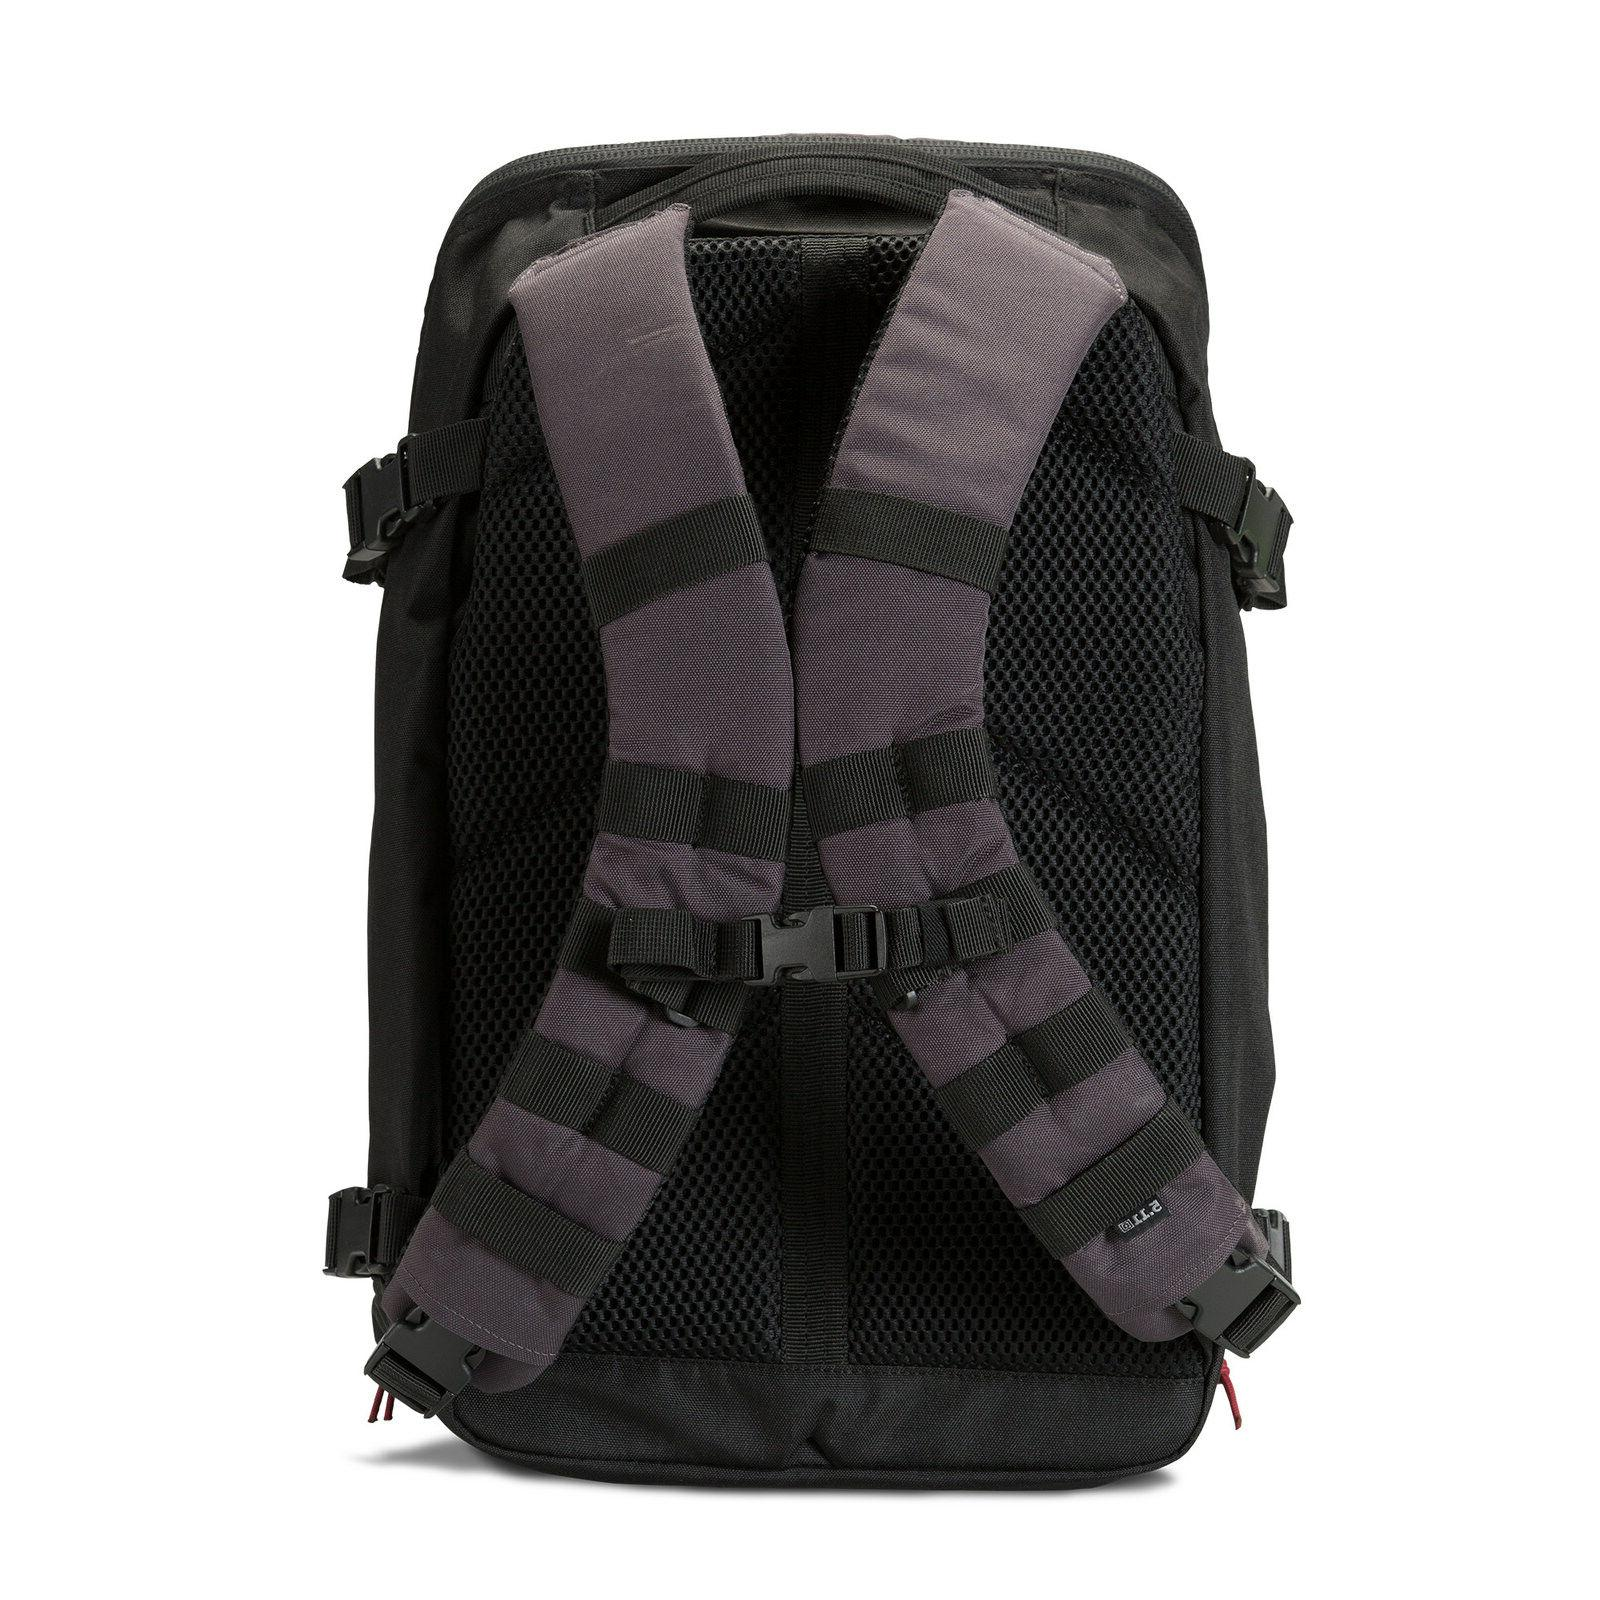 5.11 / Fast Zipper Bag Tactical Backpack Outdoor Bag